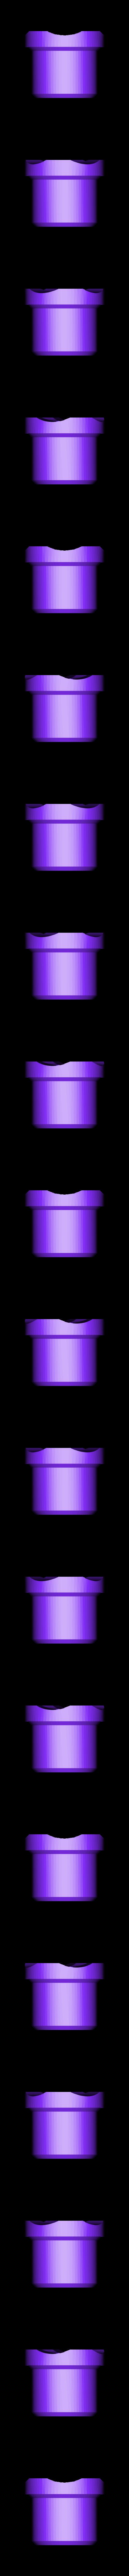 plateform_M6_screw_holder.STL Download free STL file bungee launching plateform • 3D printing object, badassdrones